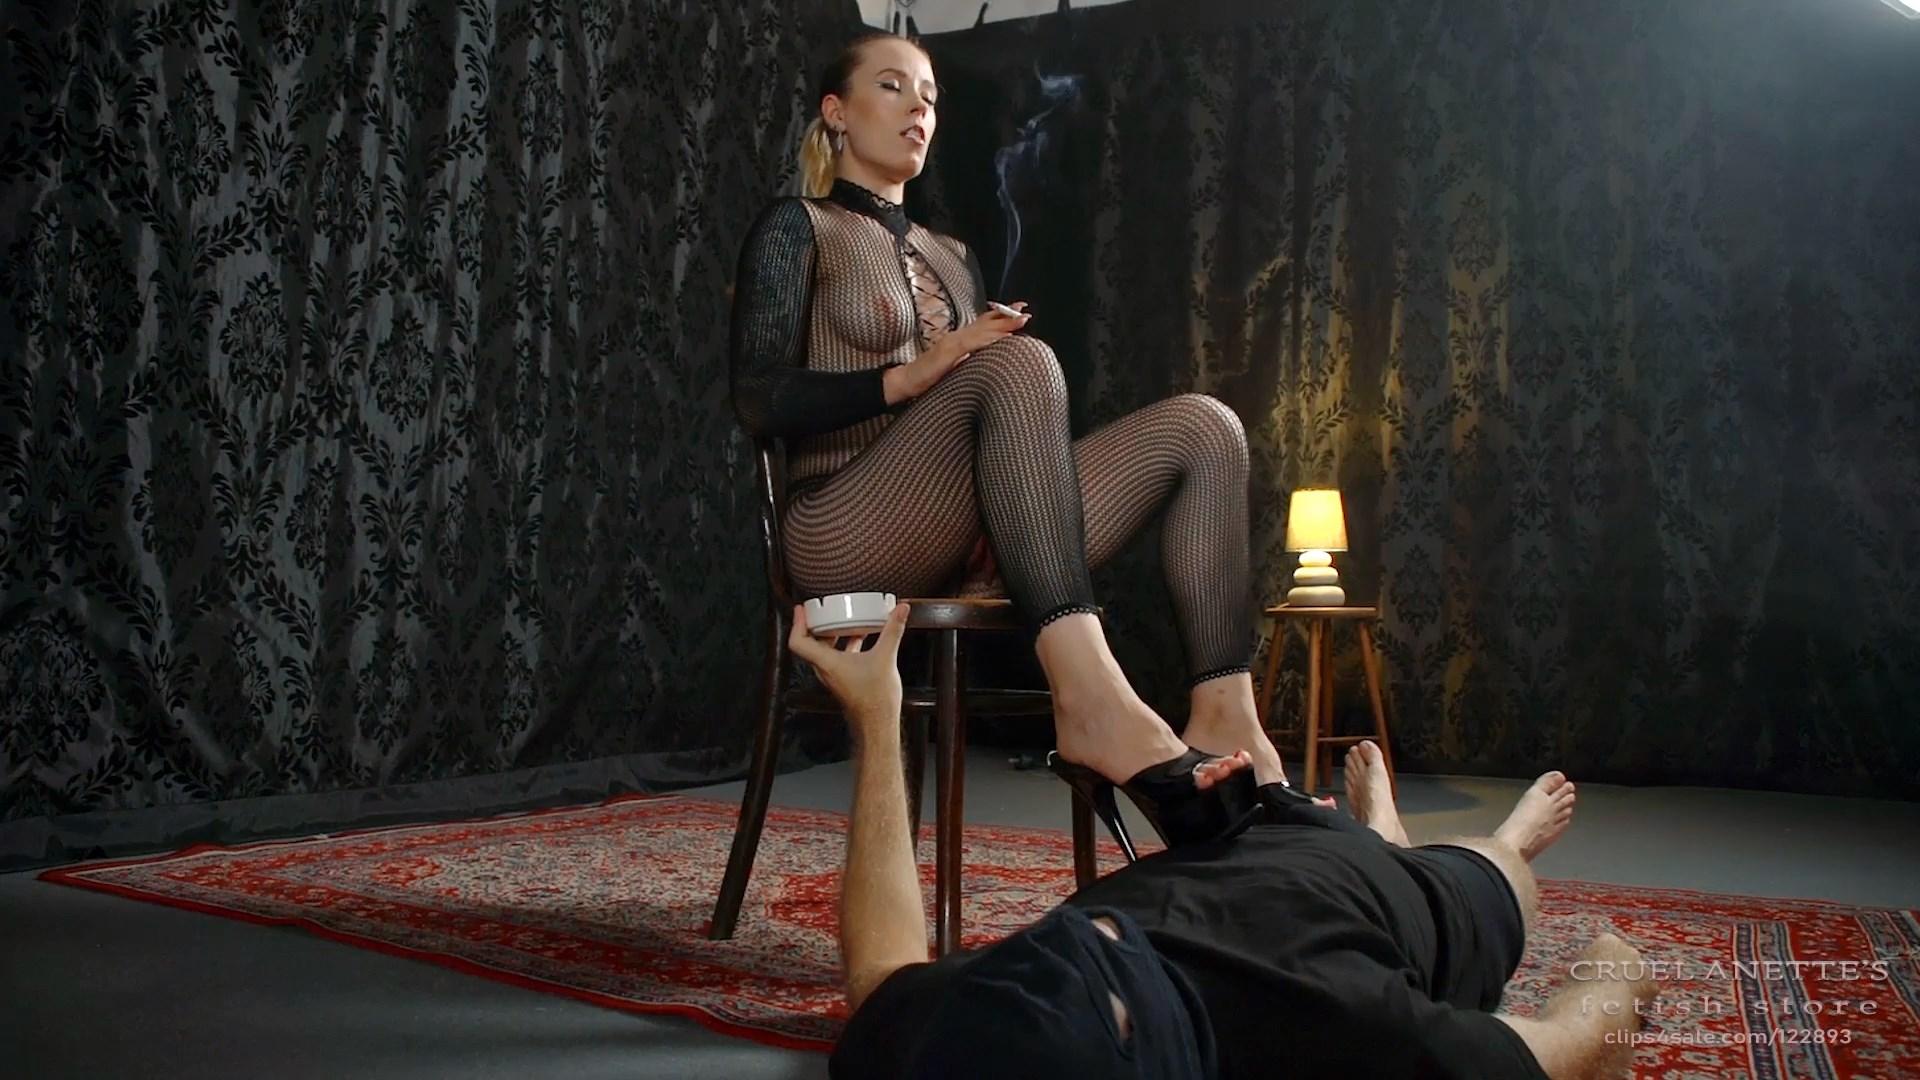 The ignored slave - CRUEL ANETTES FETISH STORE - FULL HD/1080p/MP4